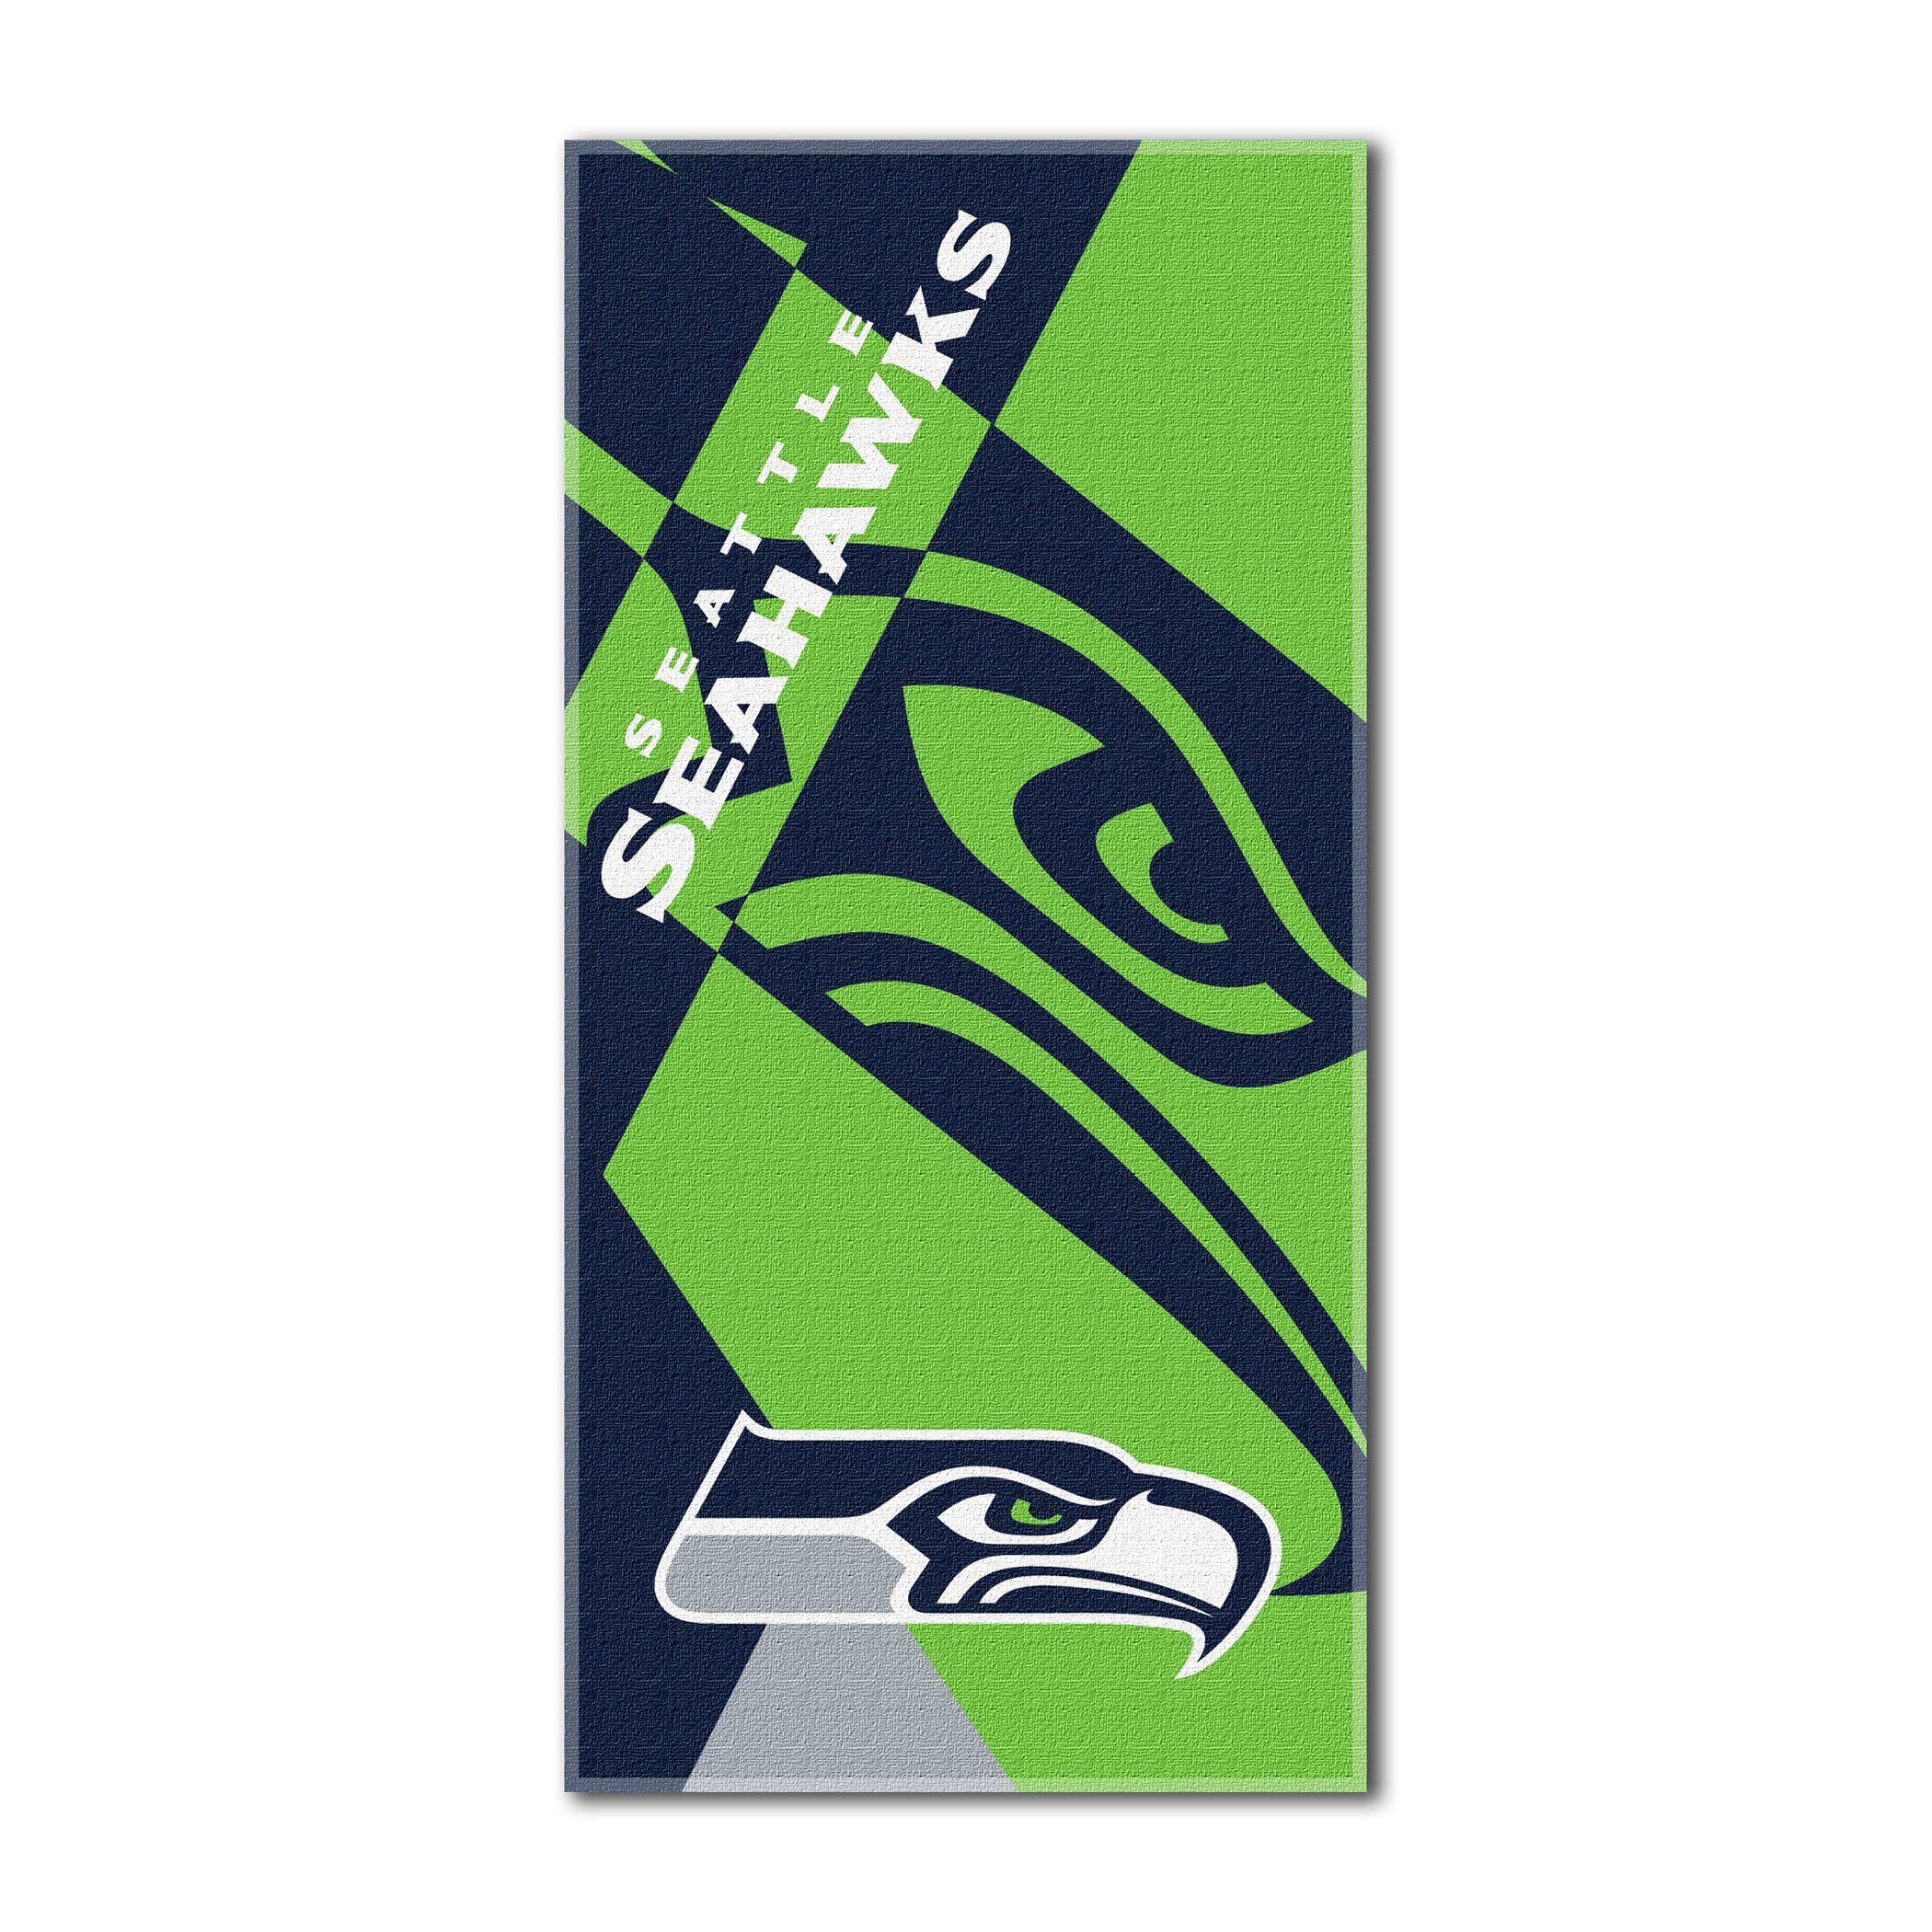 Northwest NFL 722 Seahawks Puzzle Beach Towel   Products   Pinterest